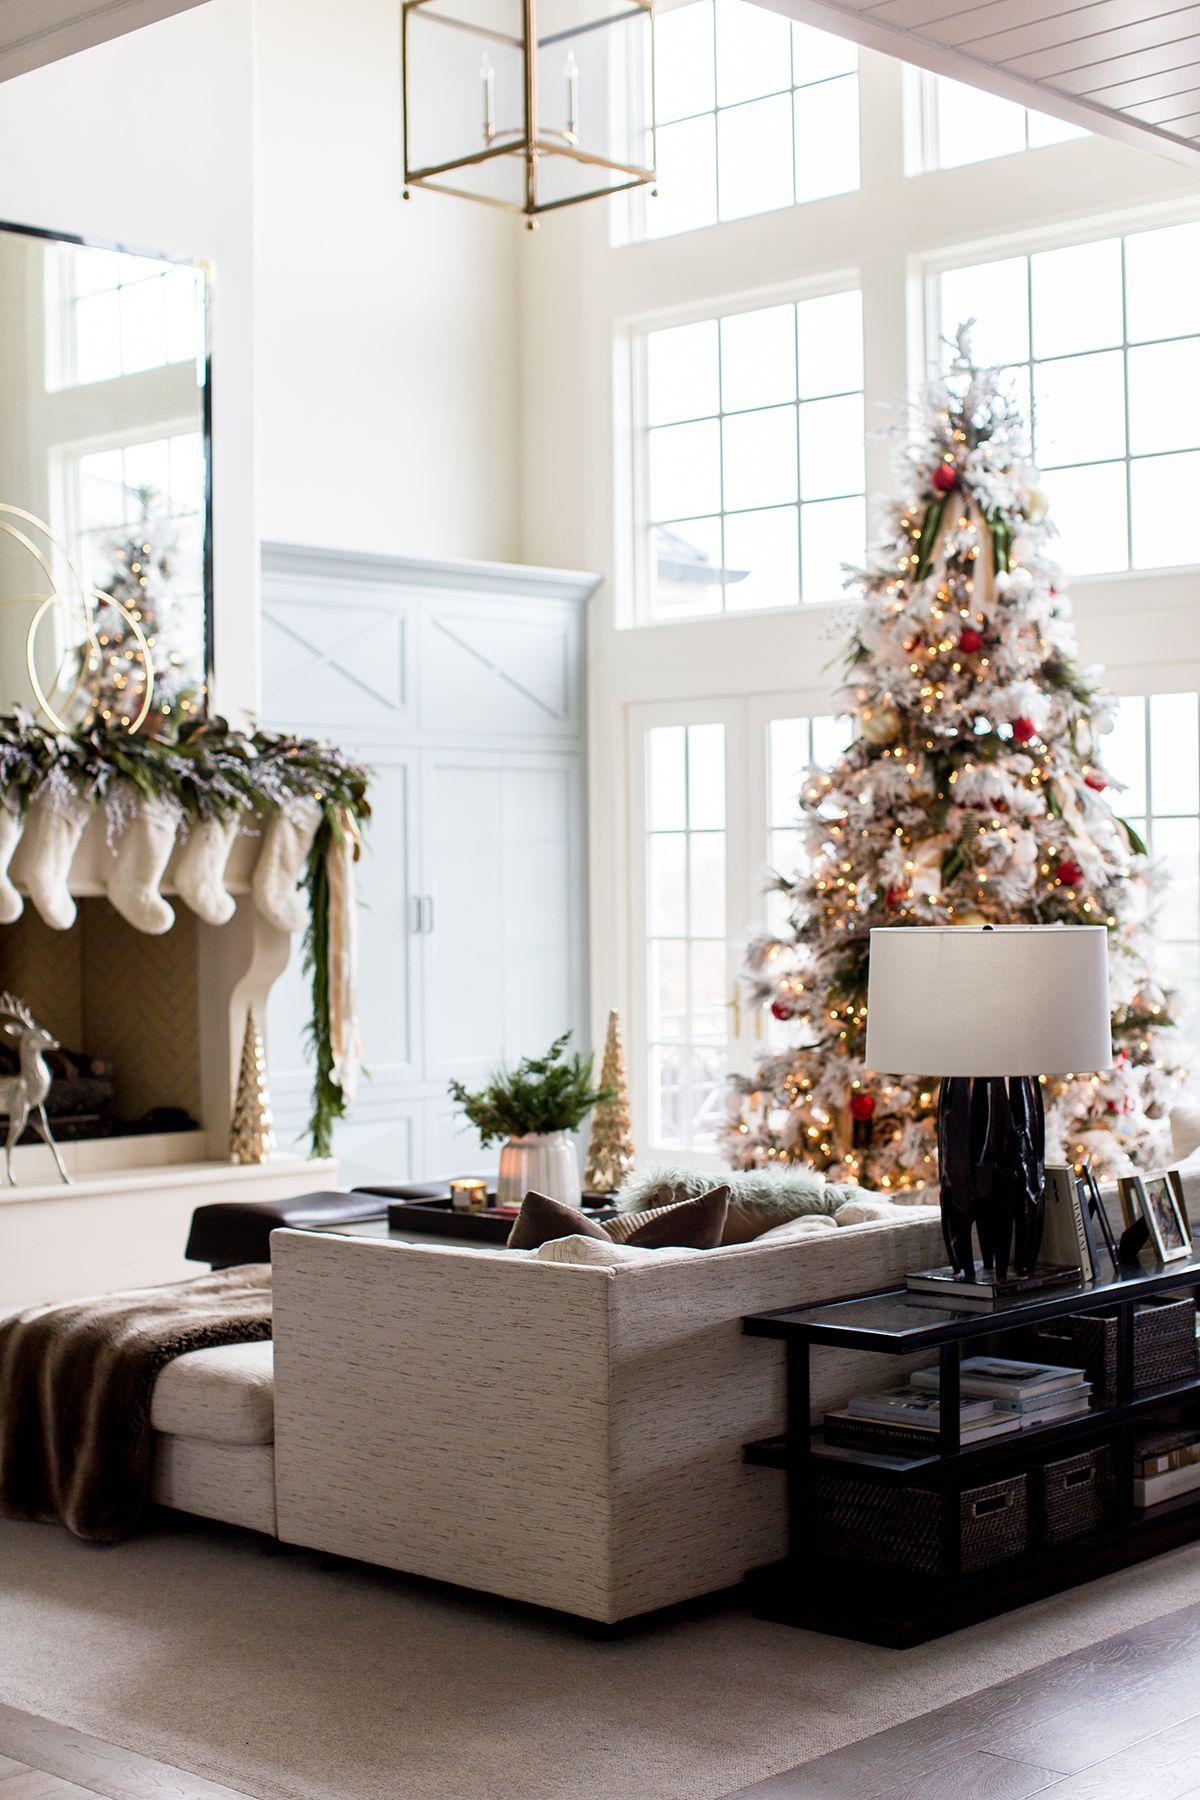 Our Home for Christmas | Pinterest | Holidays, Christmas time and ...